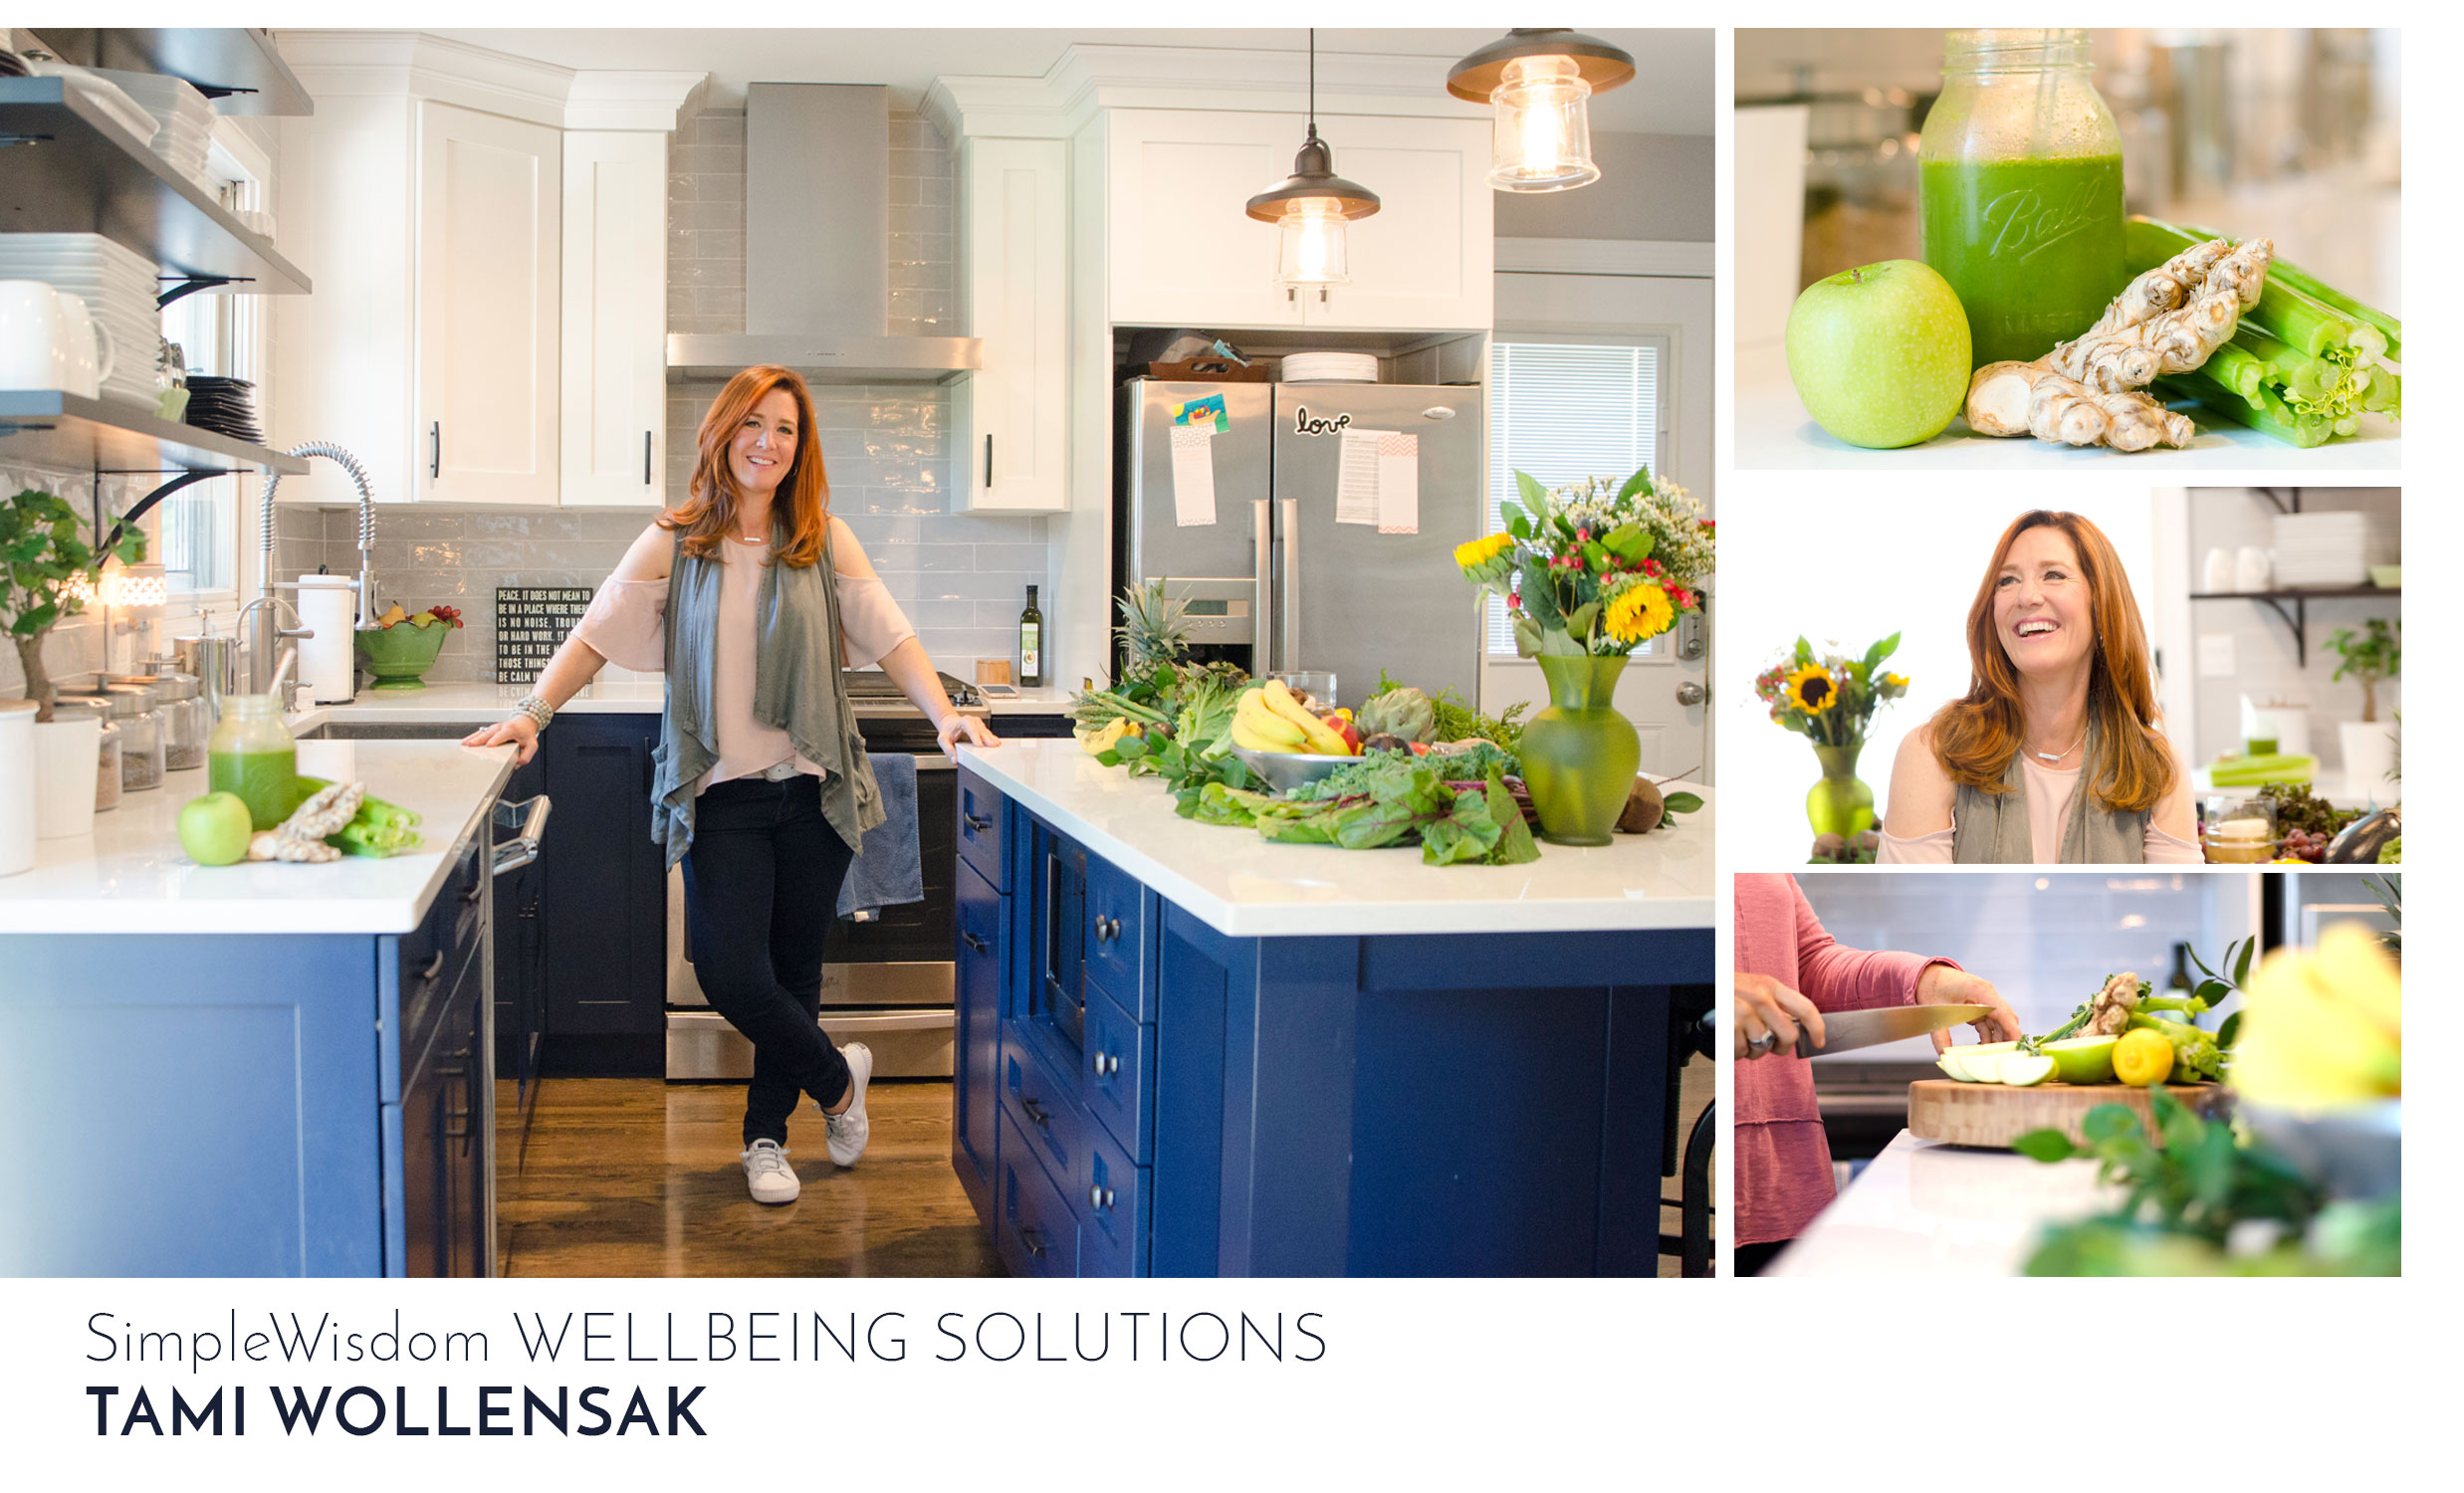 SimpleWisdon Wellbeing Solutions